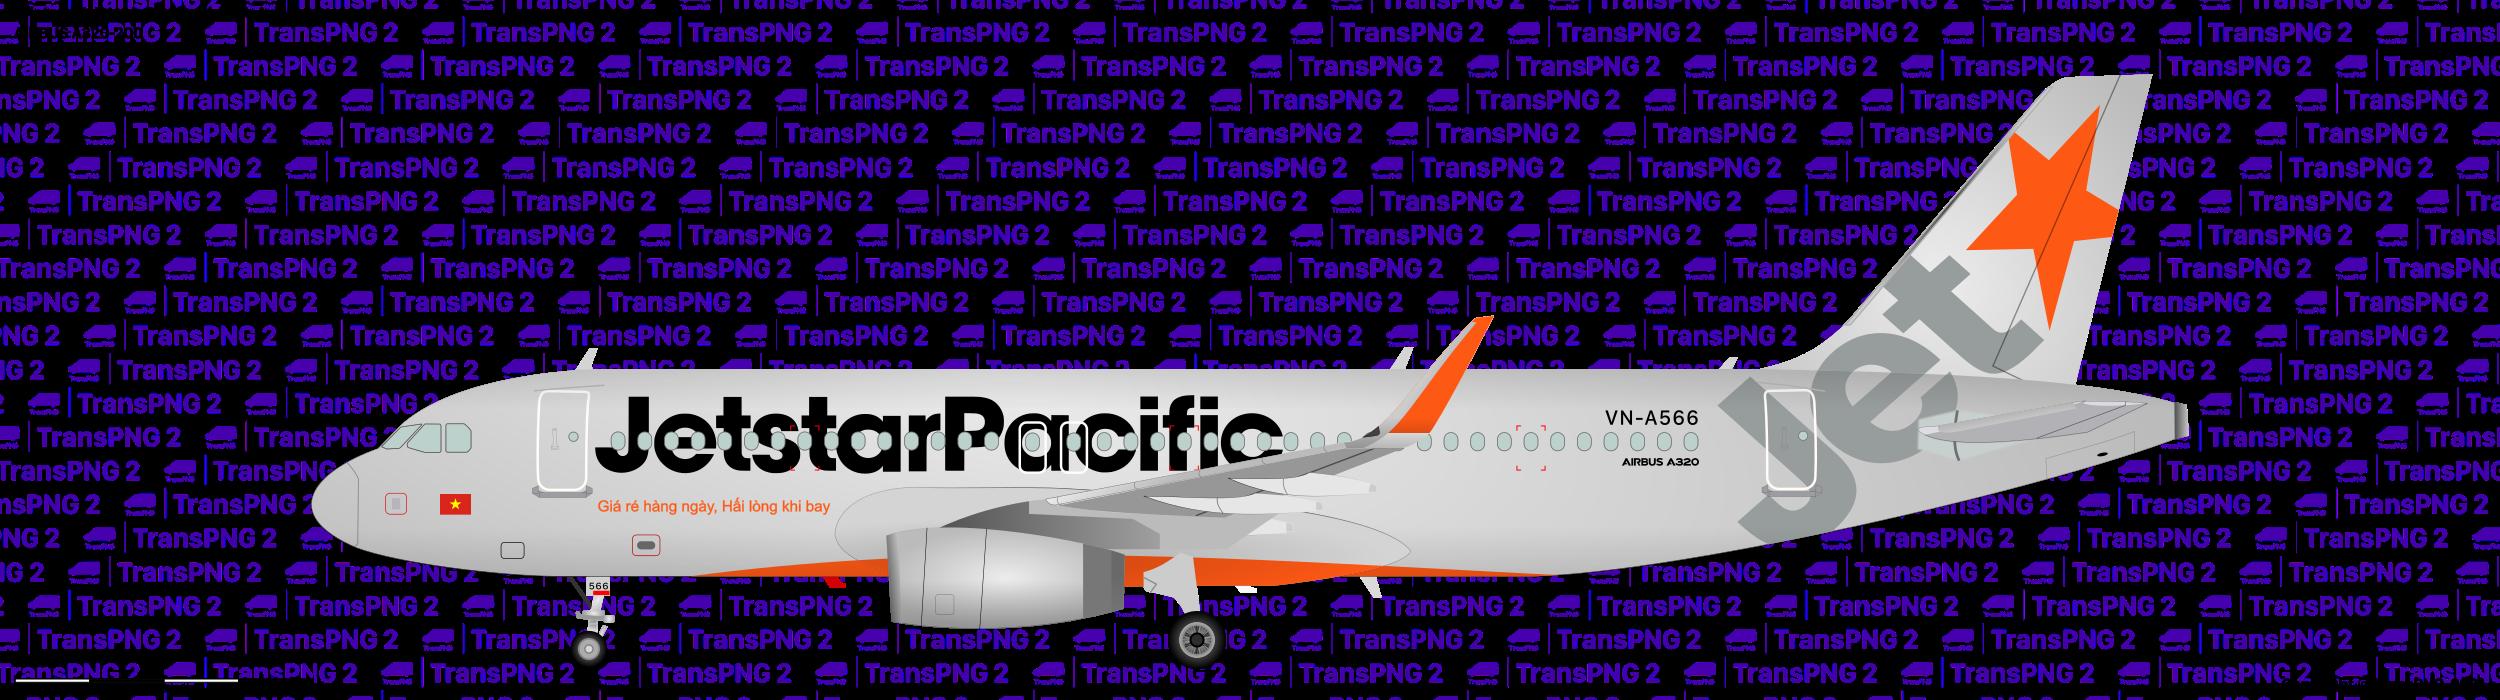 [25091] Jetstar Pacific Airlines Aviation 25091